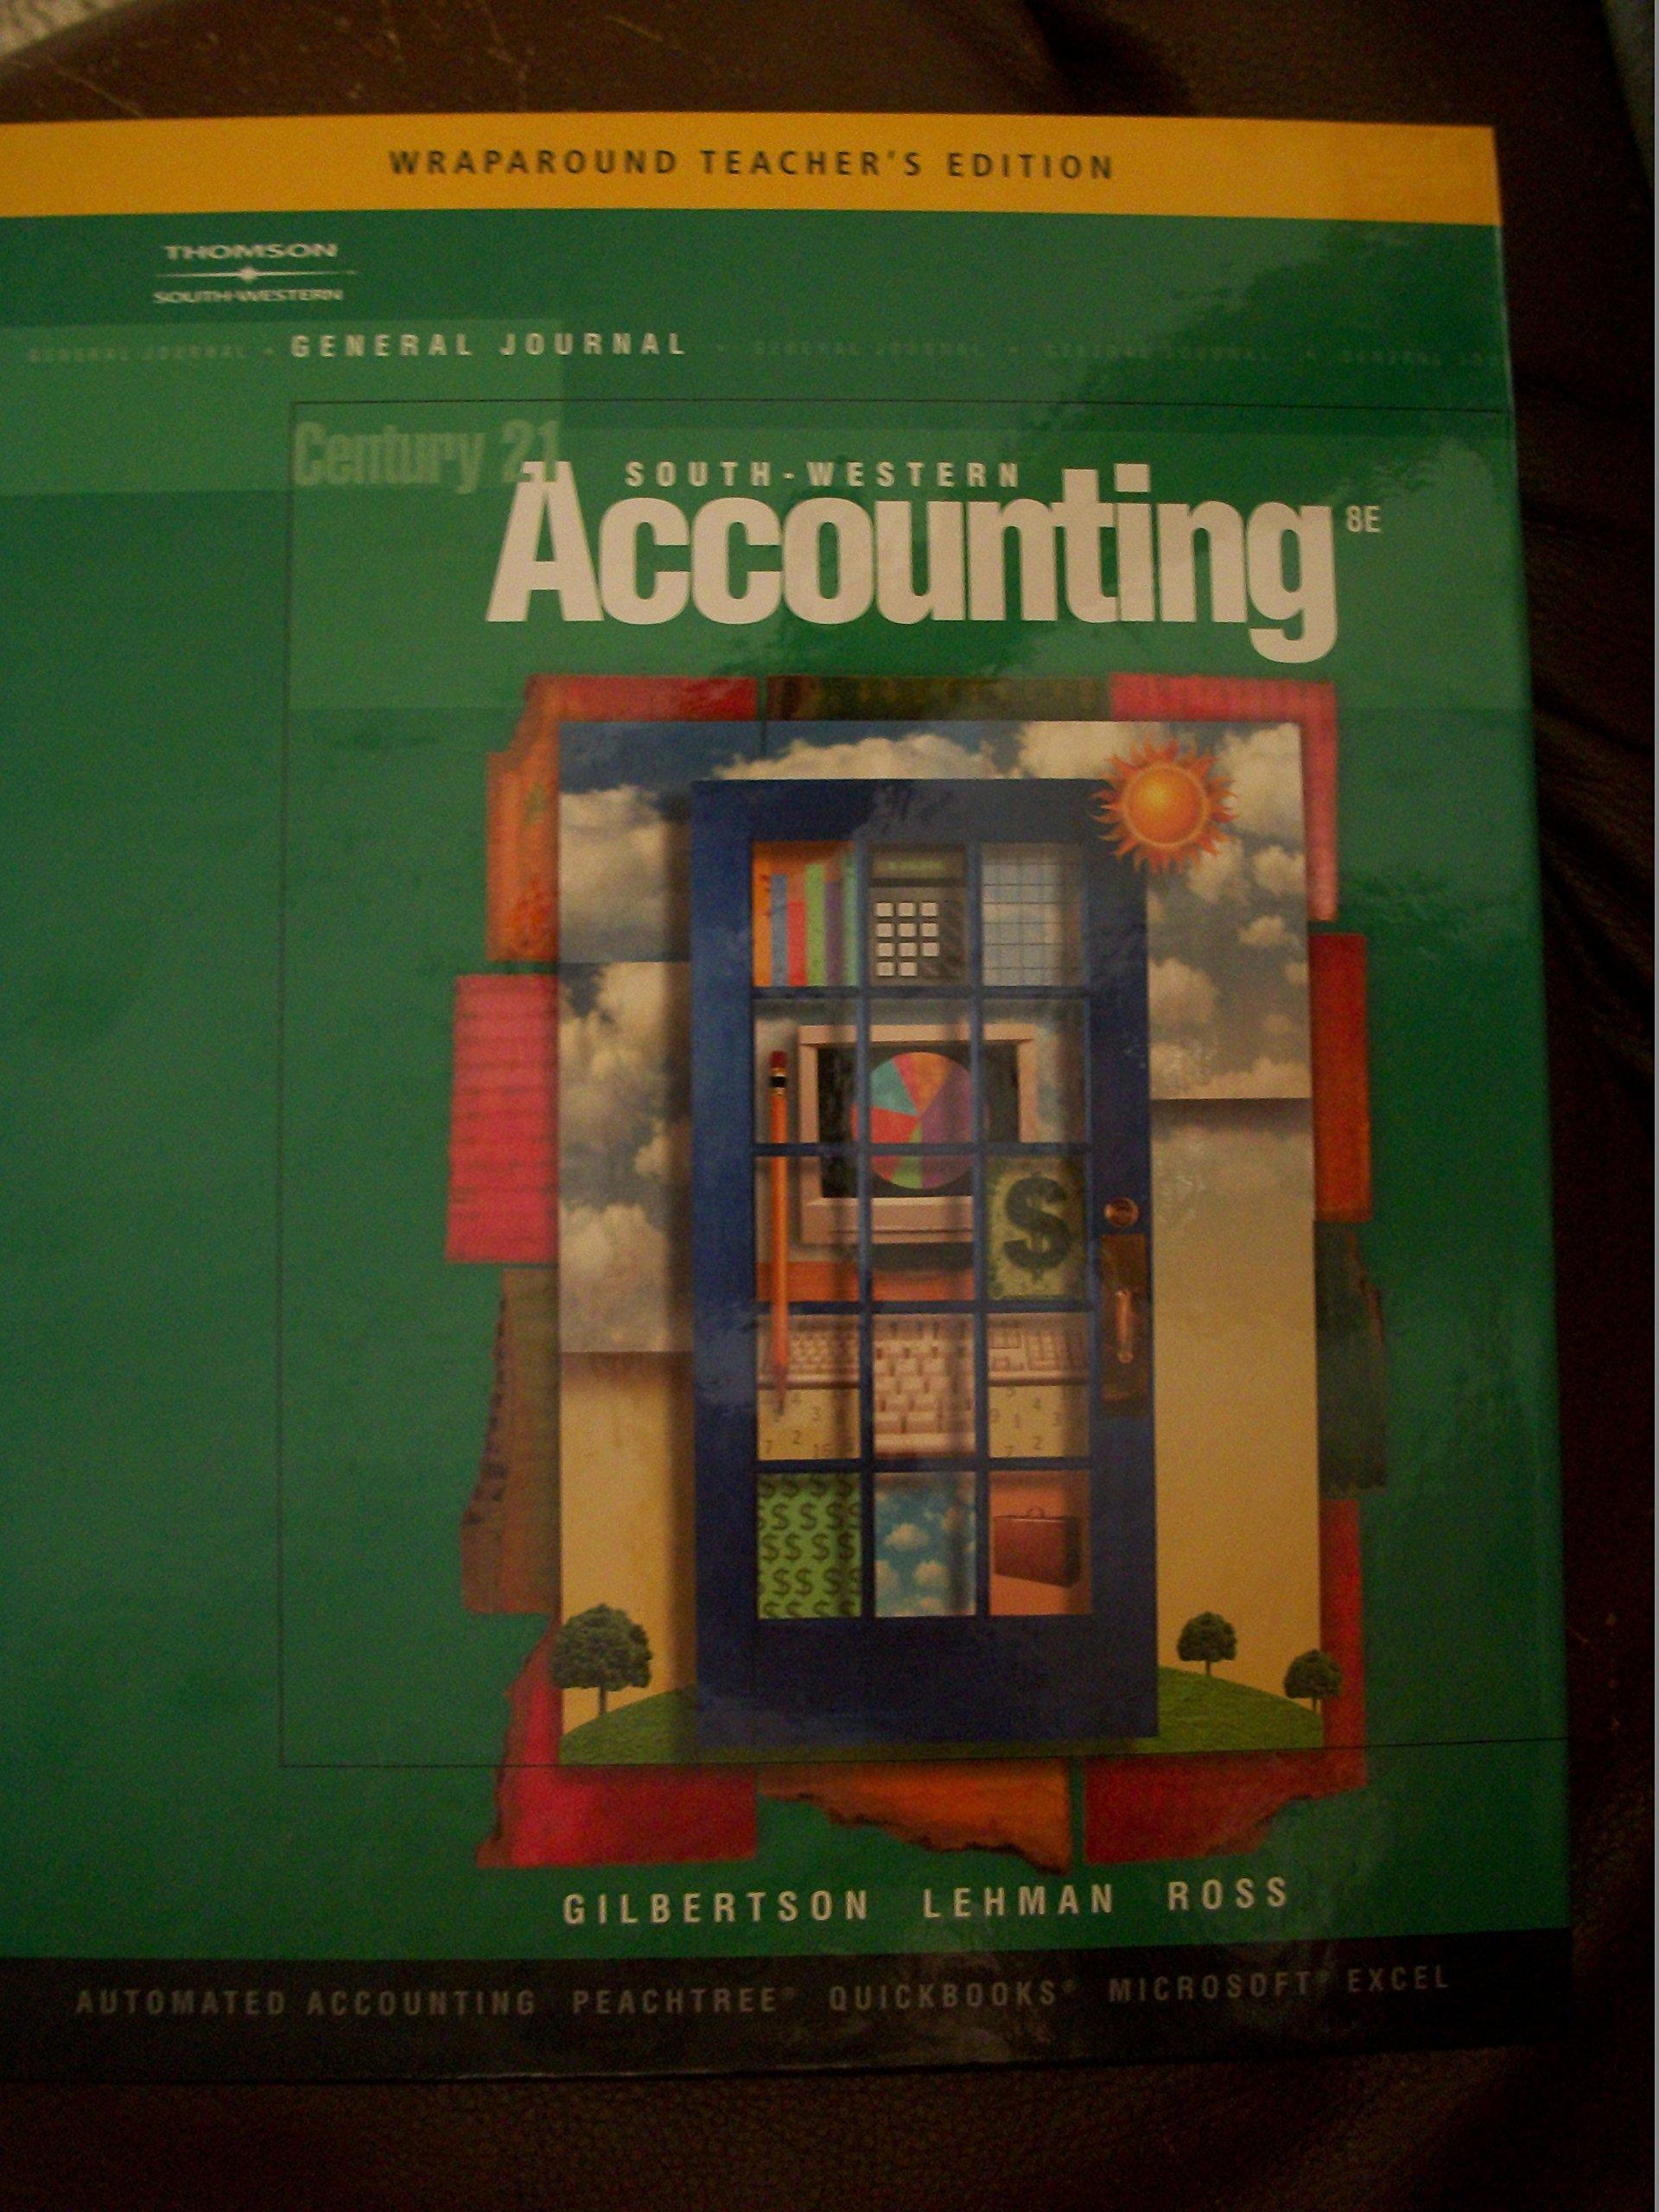 Century 21 south western accounting wraparound teachers edition century 21 south western accounting wraparound teachers edition gilbertson lehman ross 9780538972673 amazon books fandeluxe Choice Image